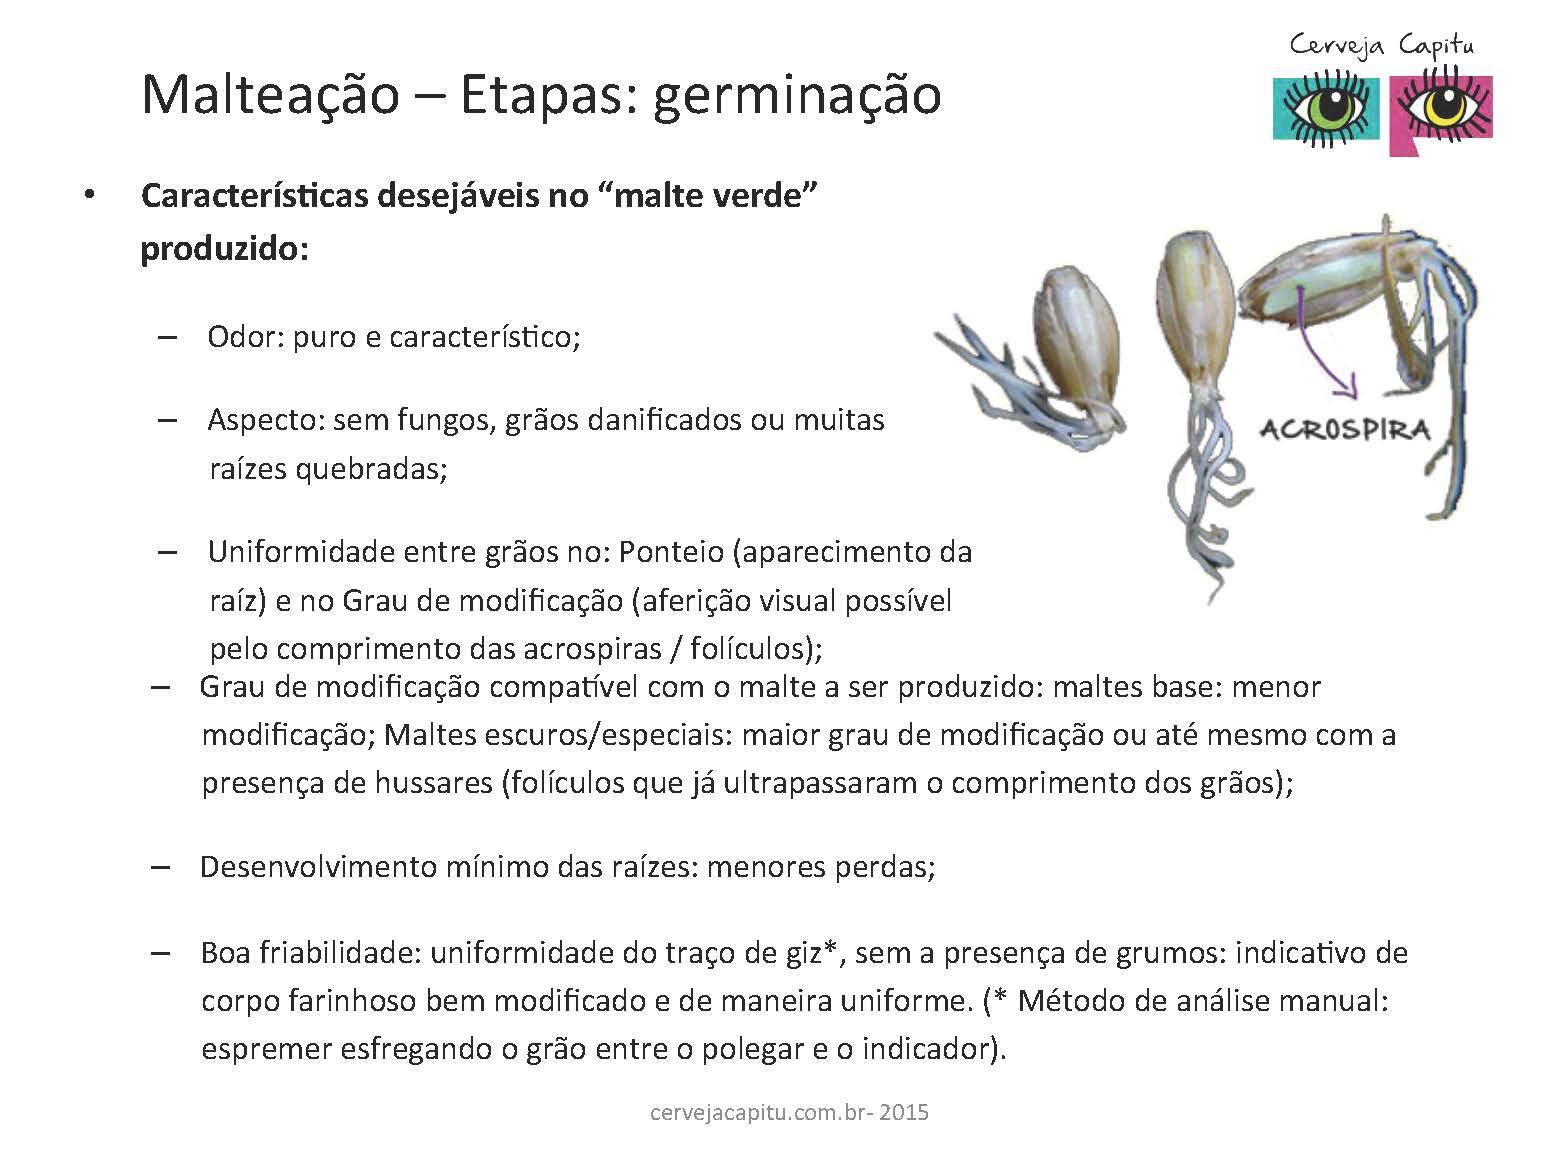 Princípios da Malteação_Capitu_SM_Page_08.jpg